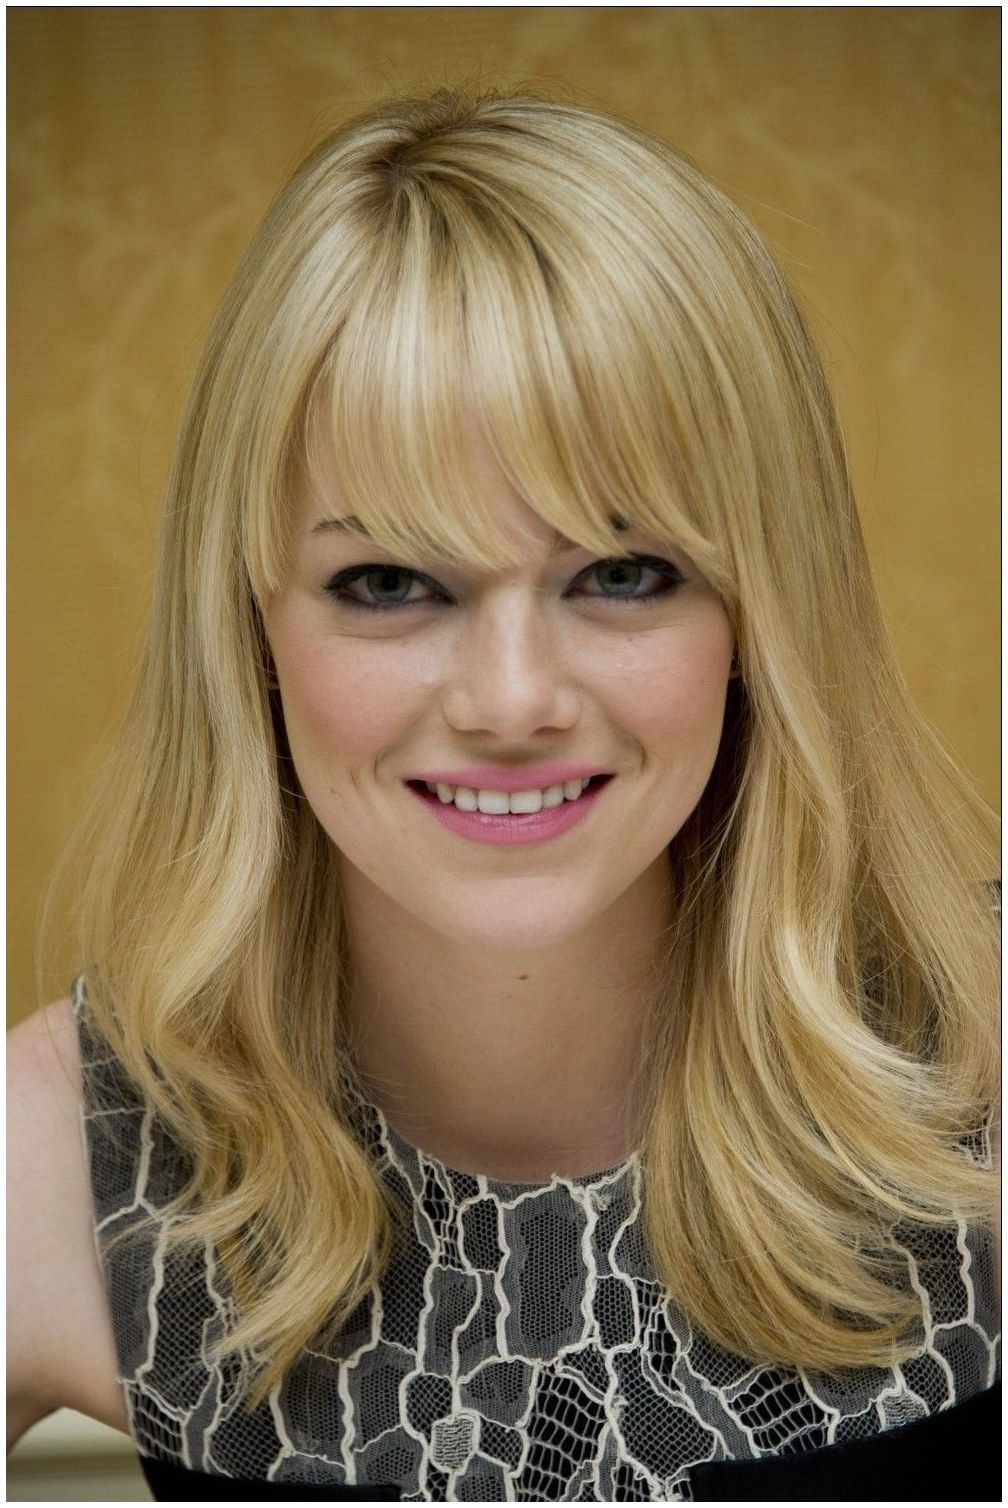 Finehair Shorthair Hairstyles Haircuts To Add Volume To Fine Hair